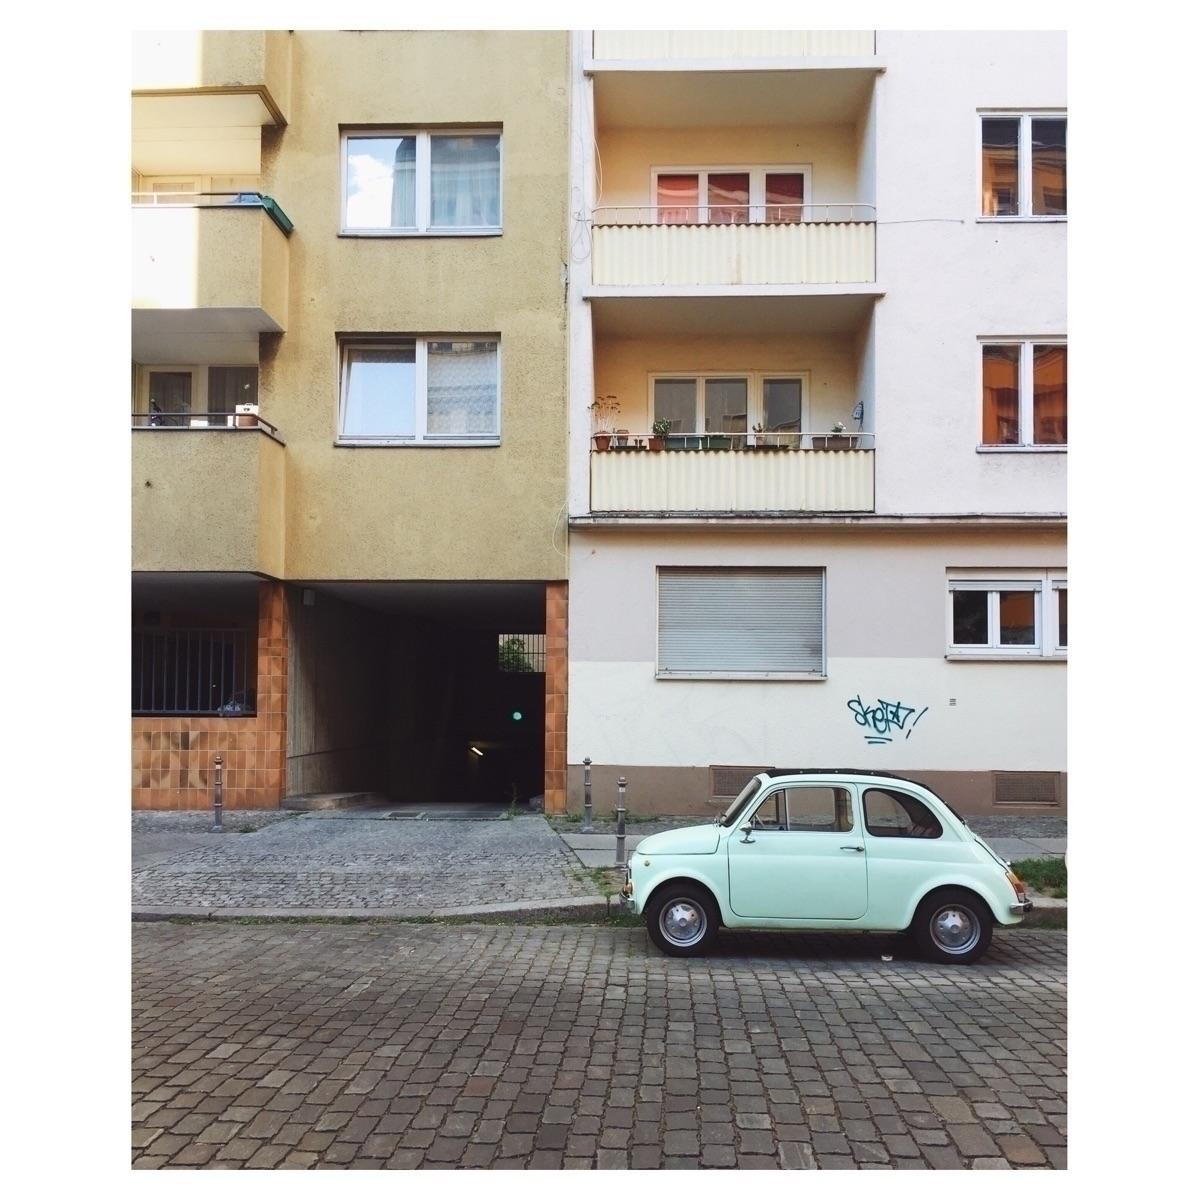 classic car 2 - madebyfelix | ello